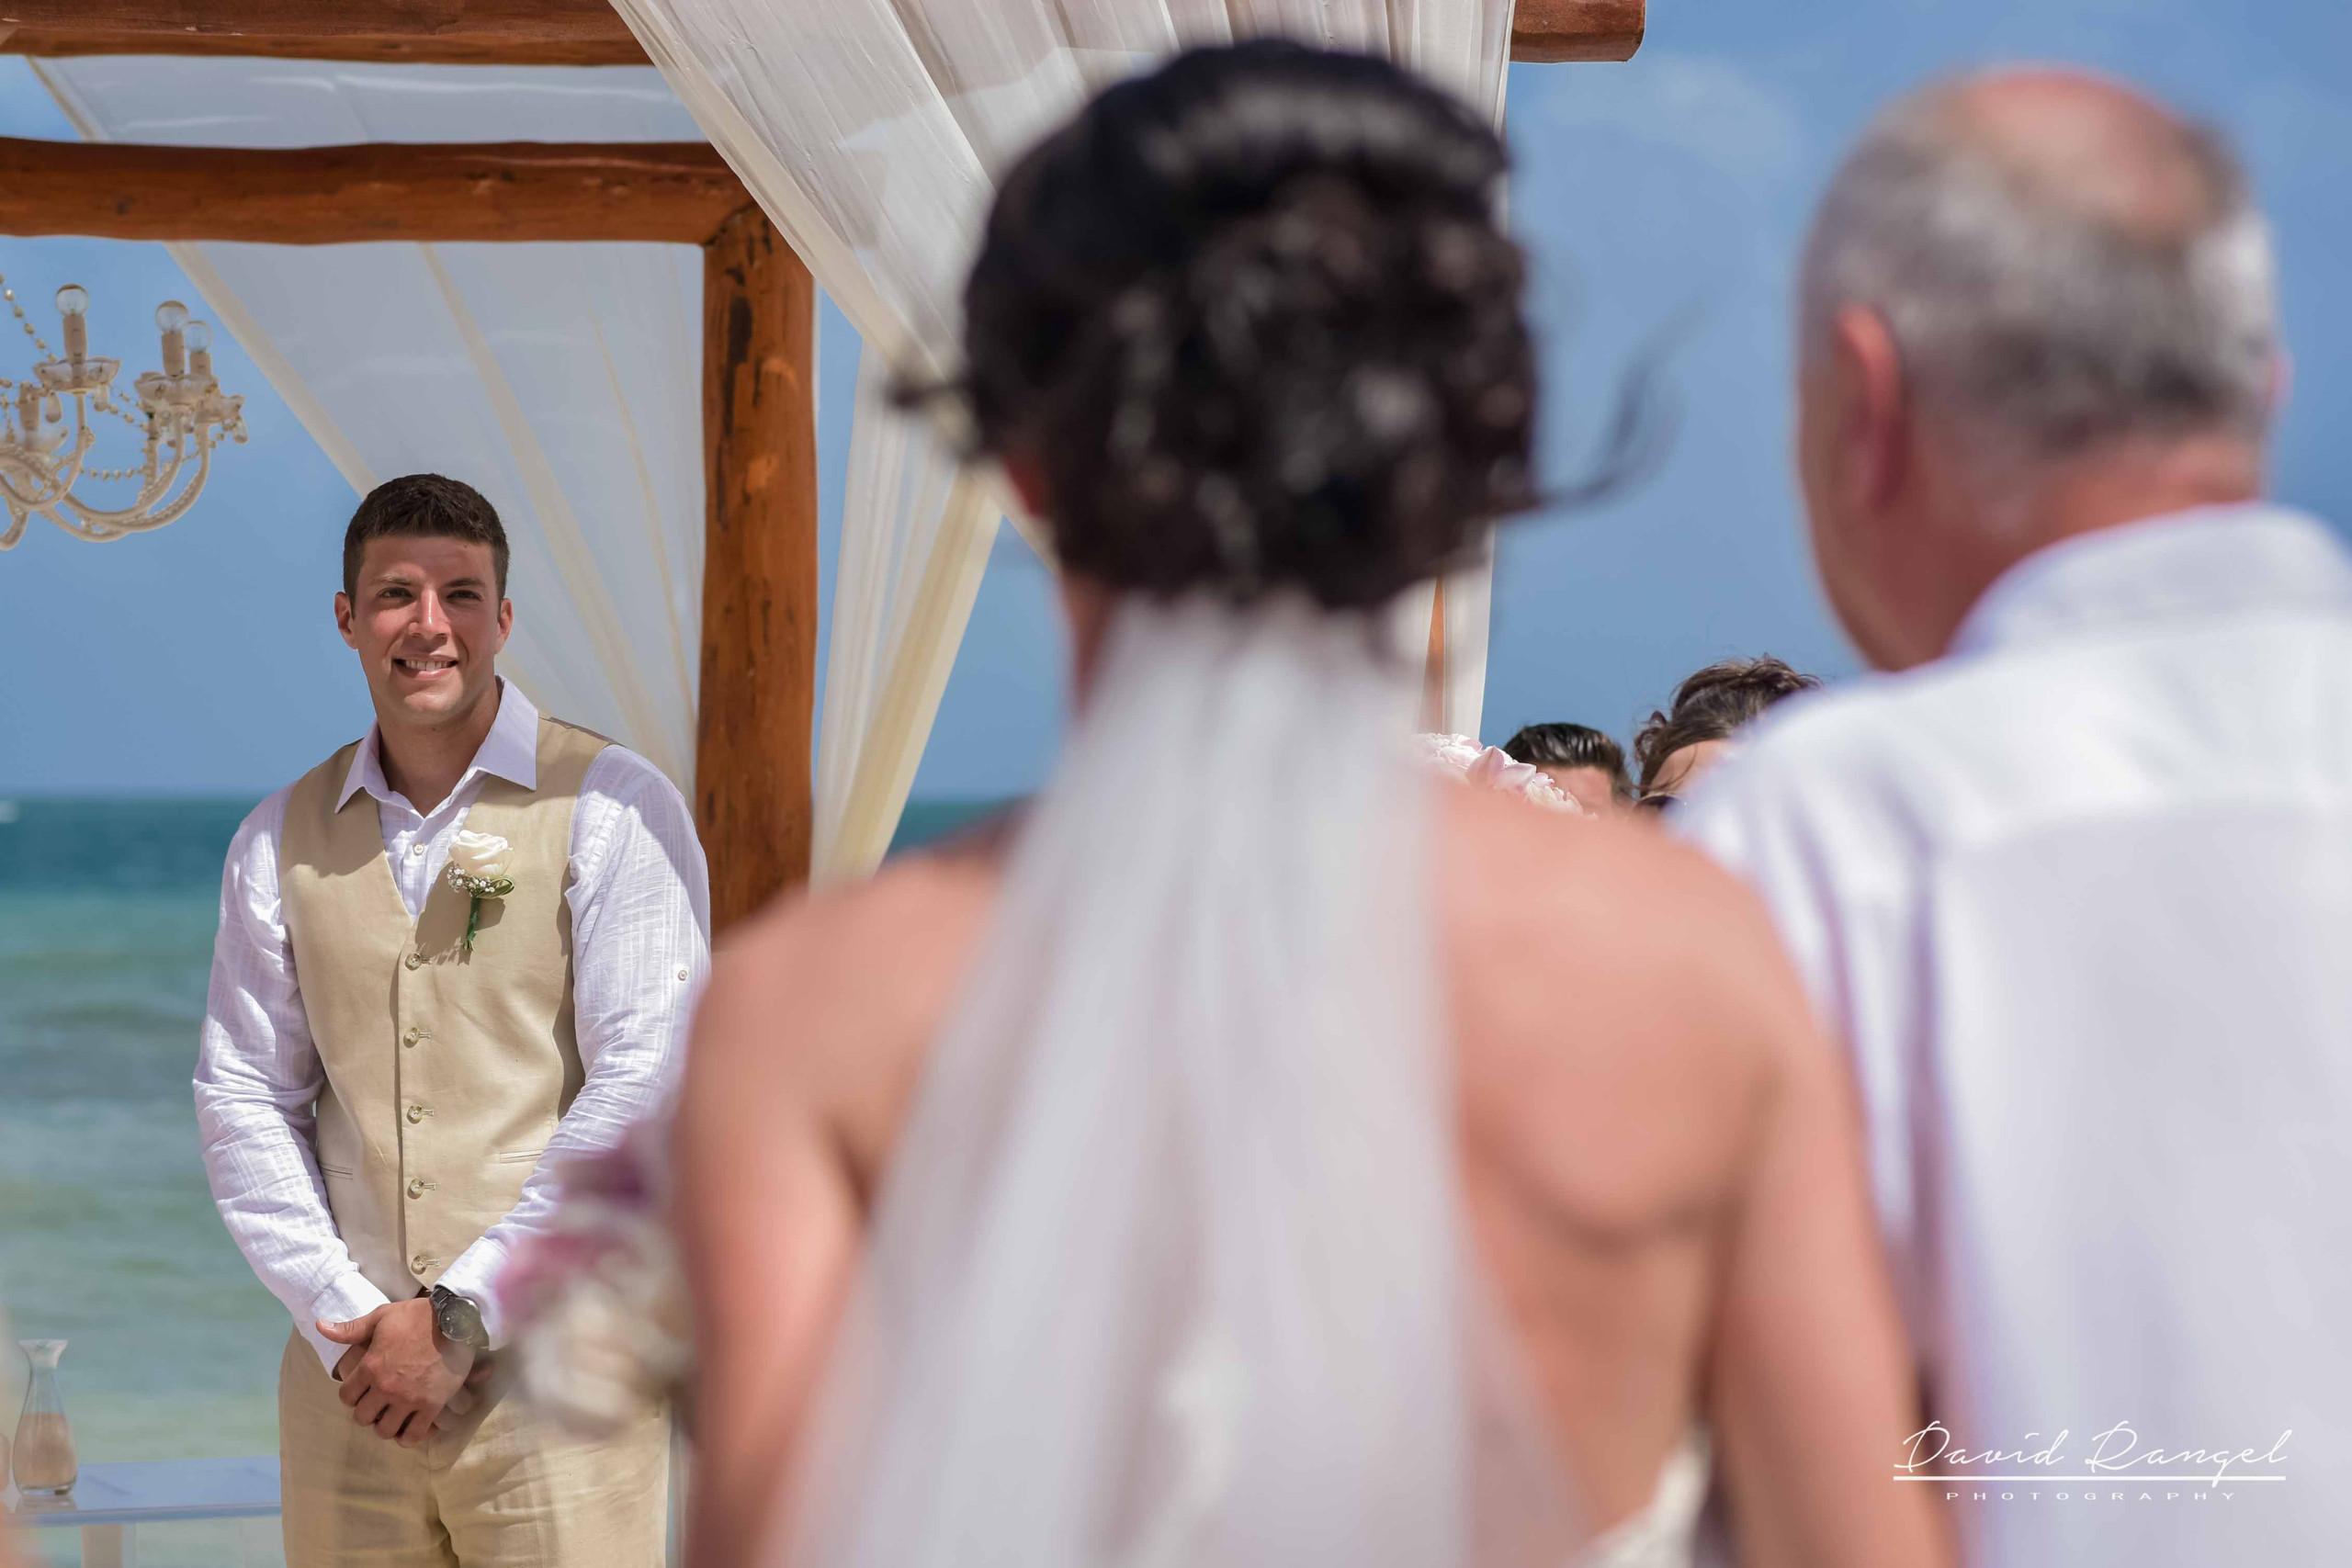 eyes+connection+bride